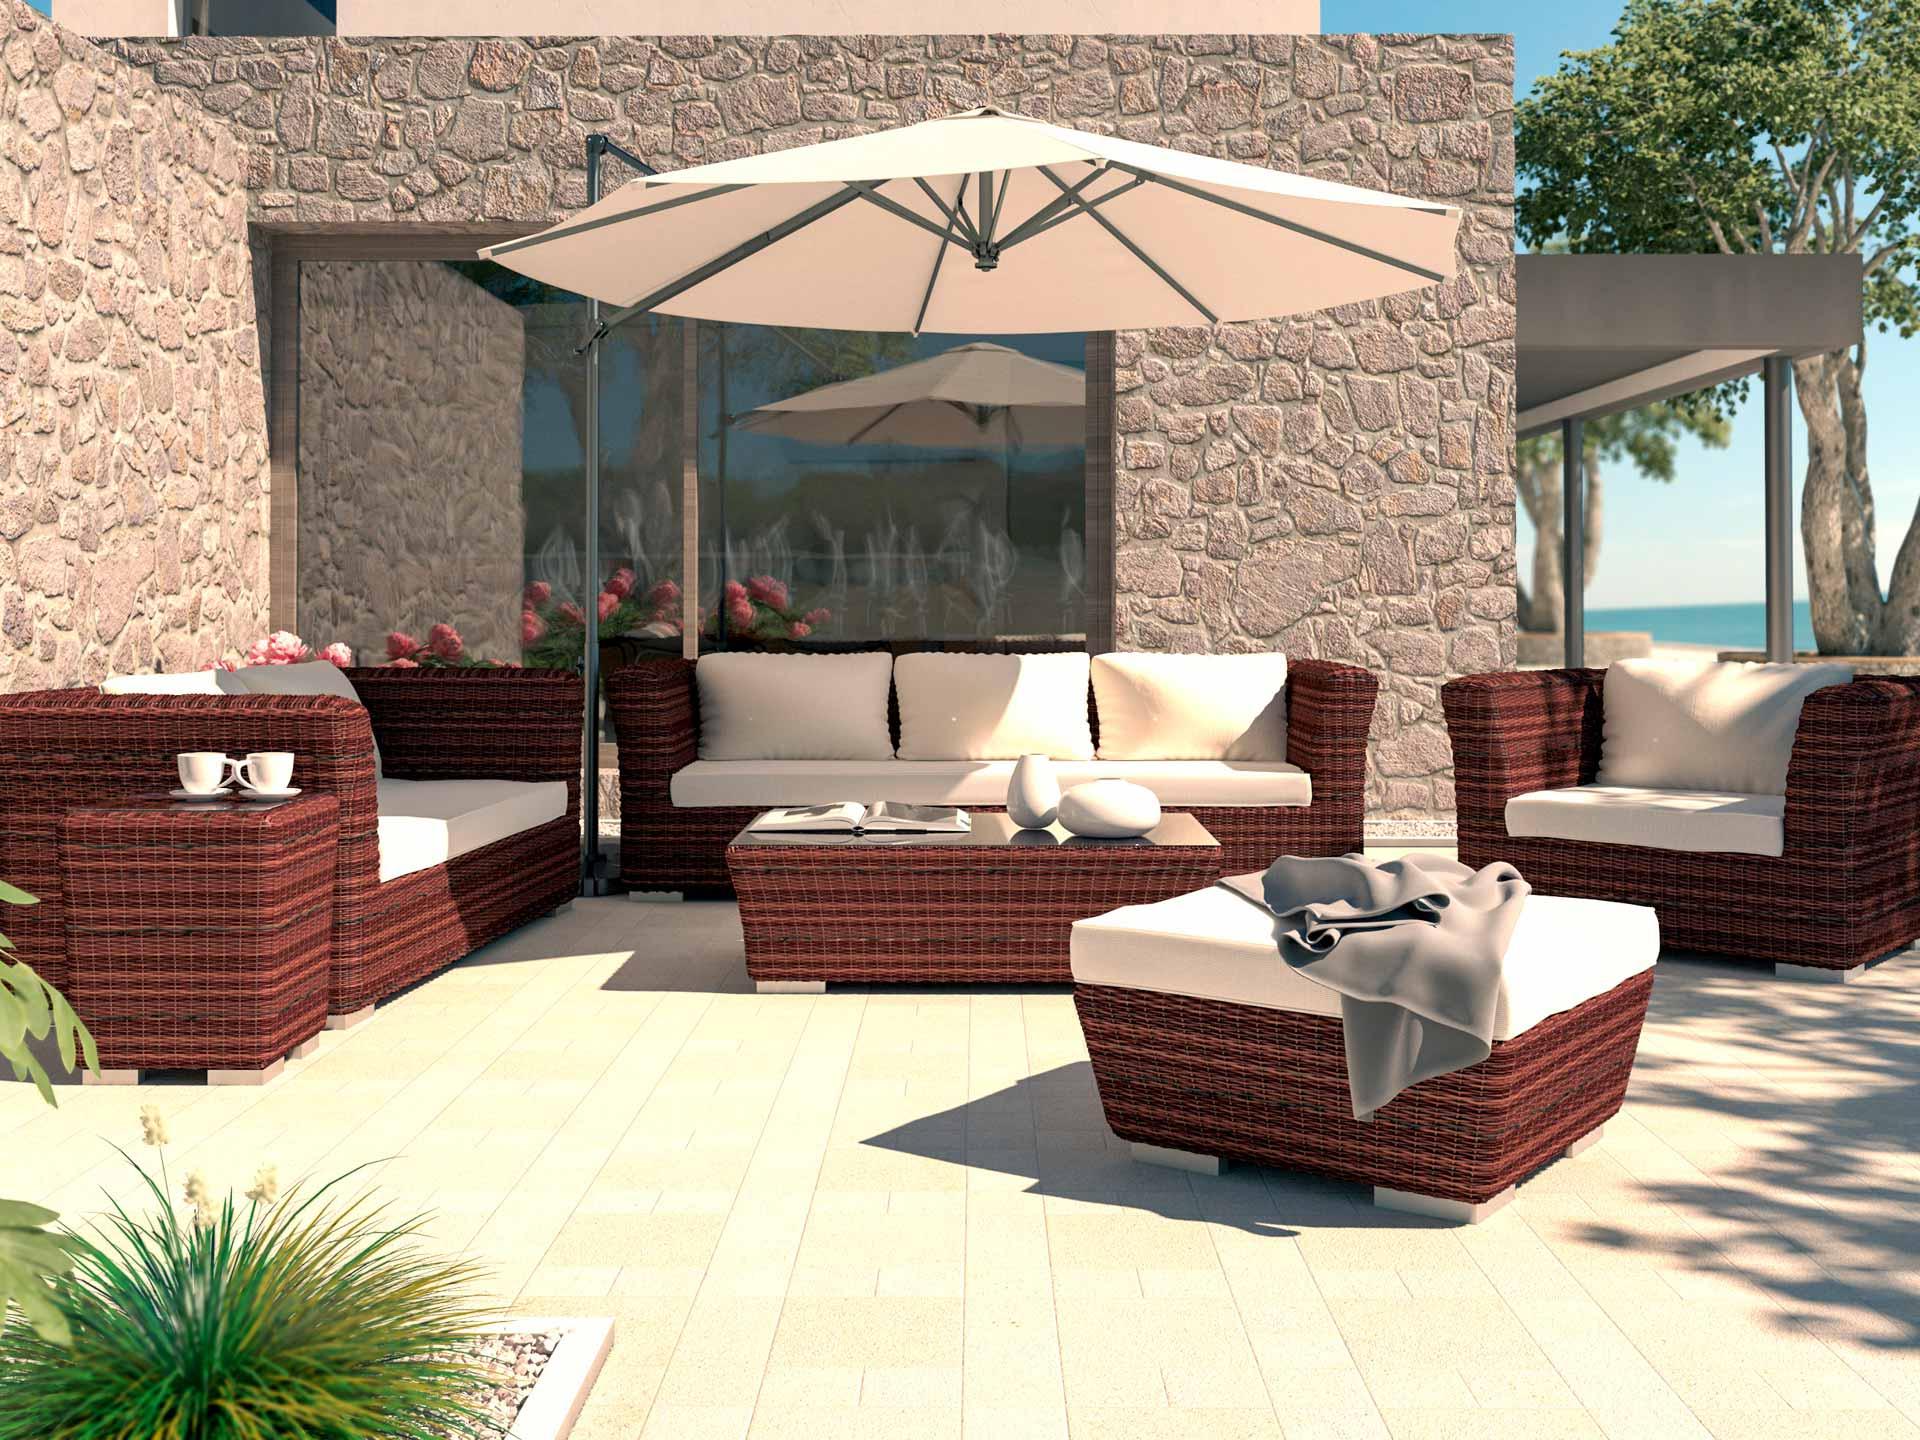 artelia terrassenm bel sitzgruppe rigantona aus polyrattan. Black Bedroom Furniture Sets. Home Design Ideas